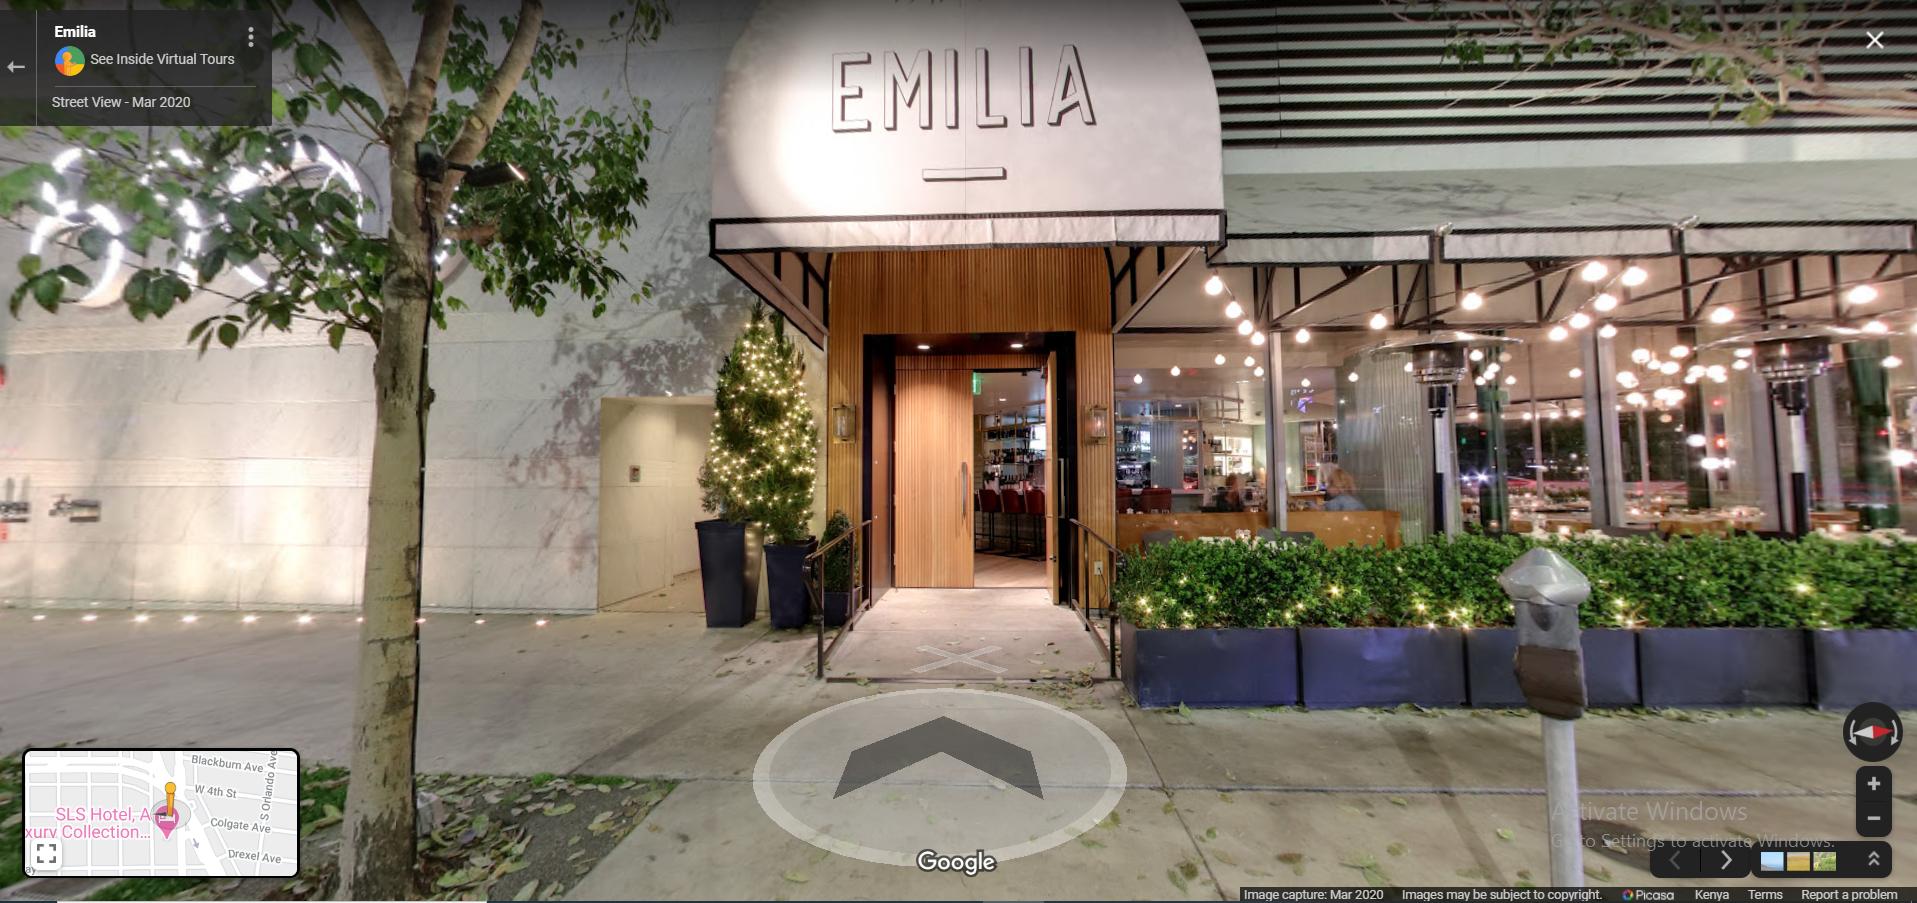 Emilia - Los Angeles